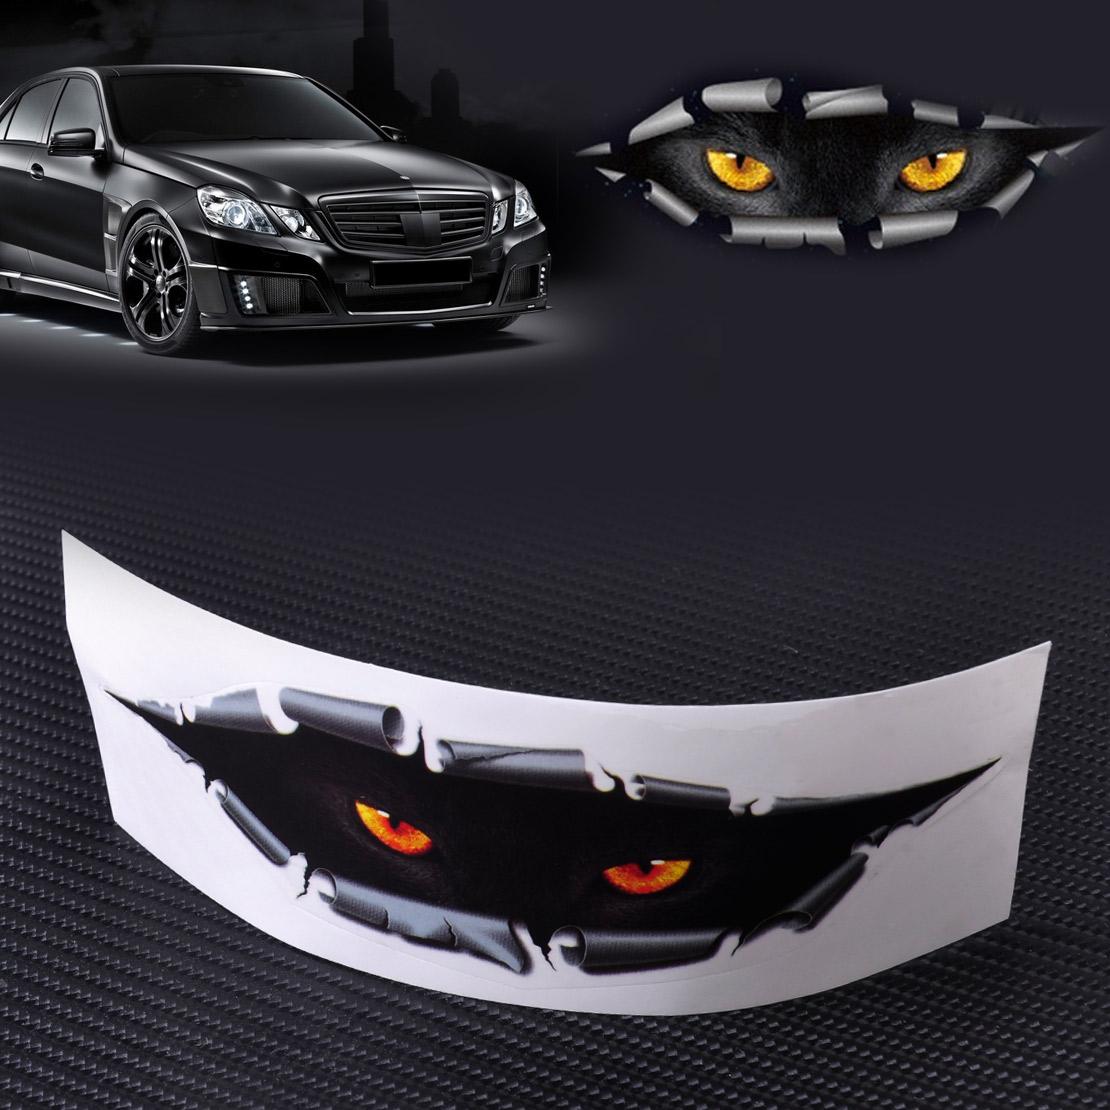 Design a car decal online - Car Styling Funny 3d Simulation Monster Leopard Eye Peeking Sticker Decal Auto Car Window Mirror Trucks